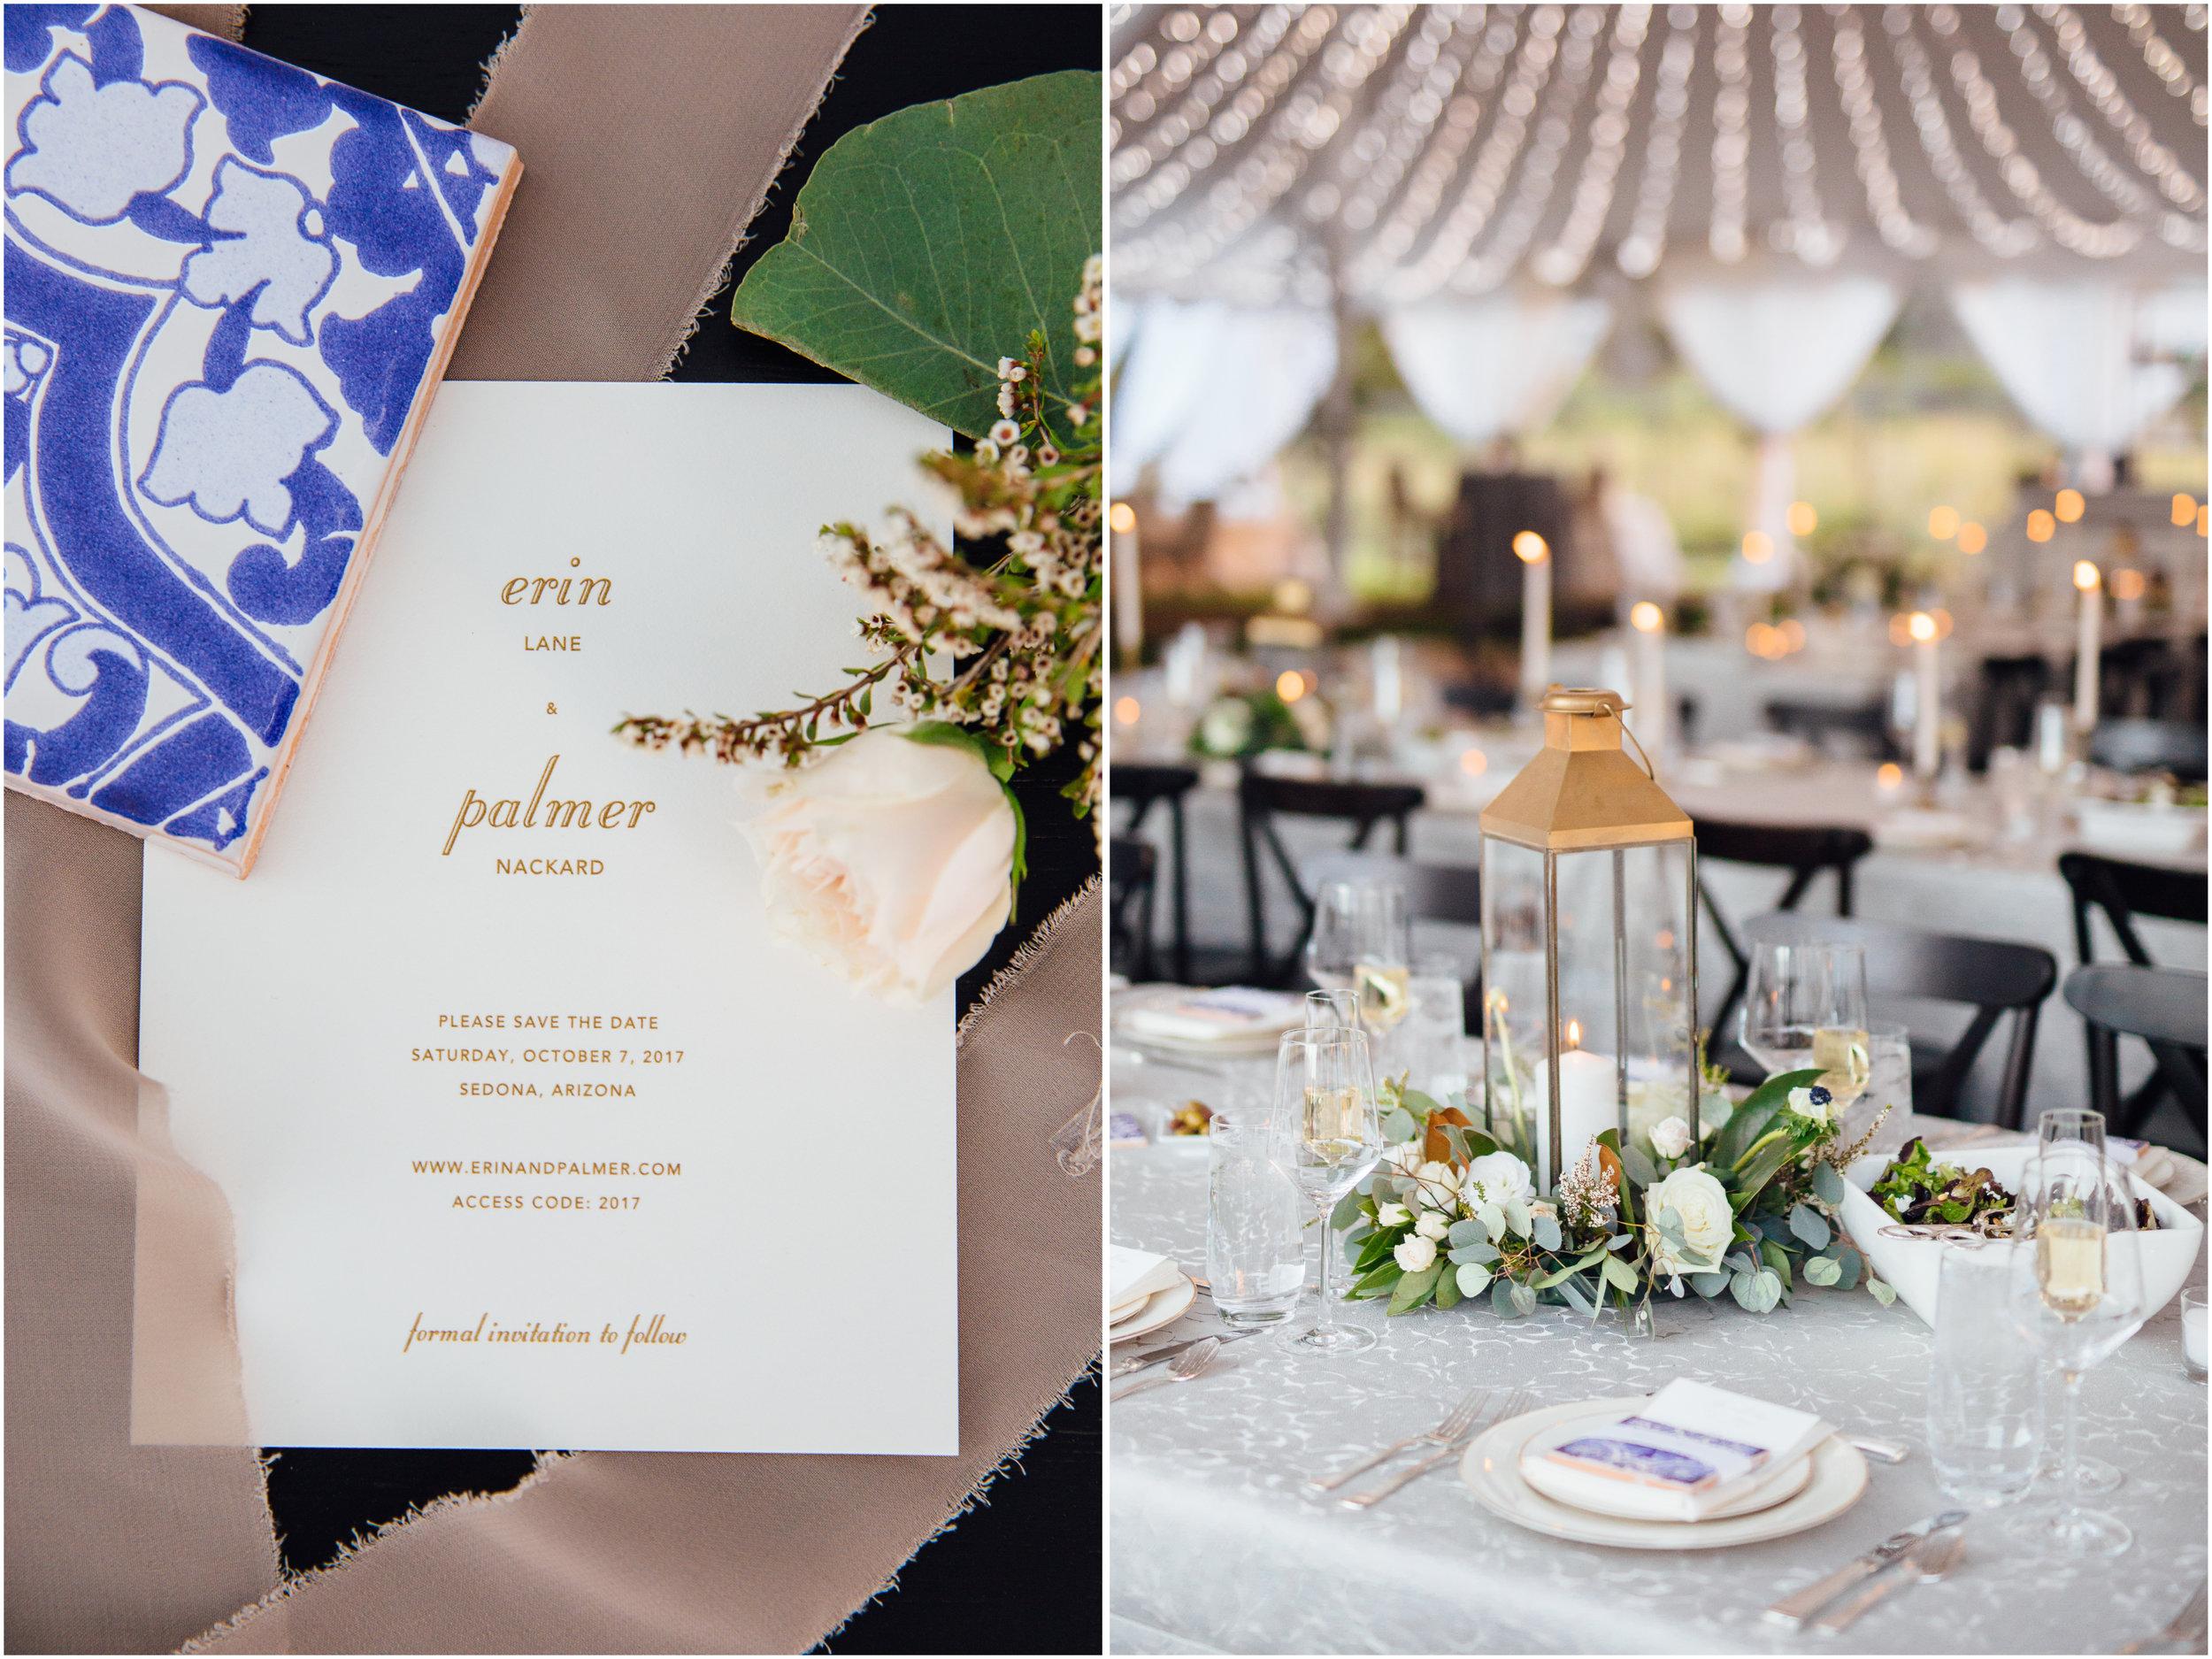 Sedona-wedding-details.jpg